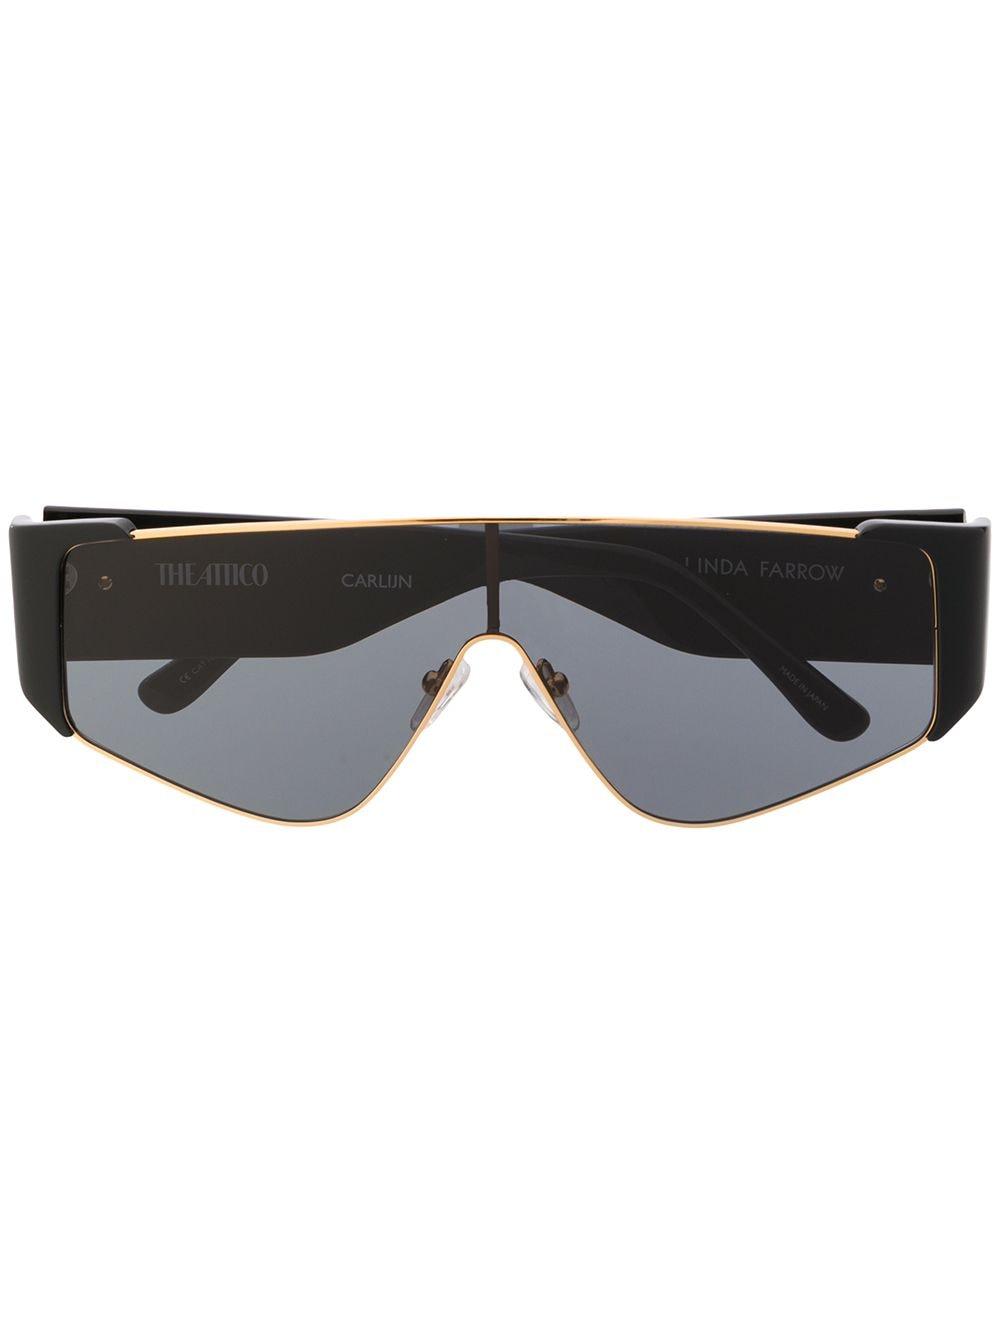 Linda Farrow 'Attico' Oversized-Sonnenbrille - Schwarz